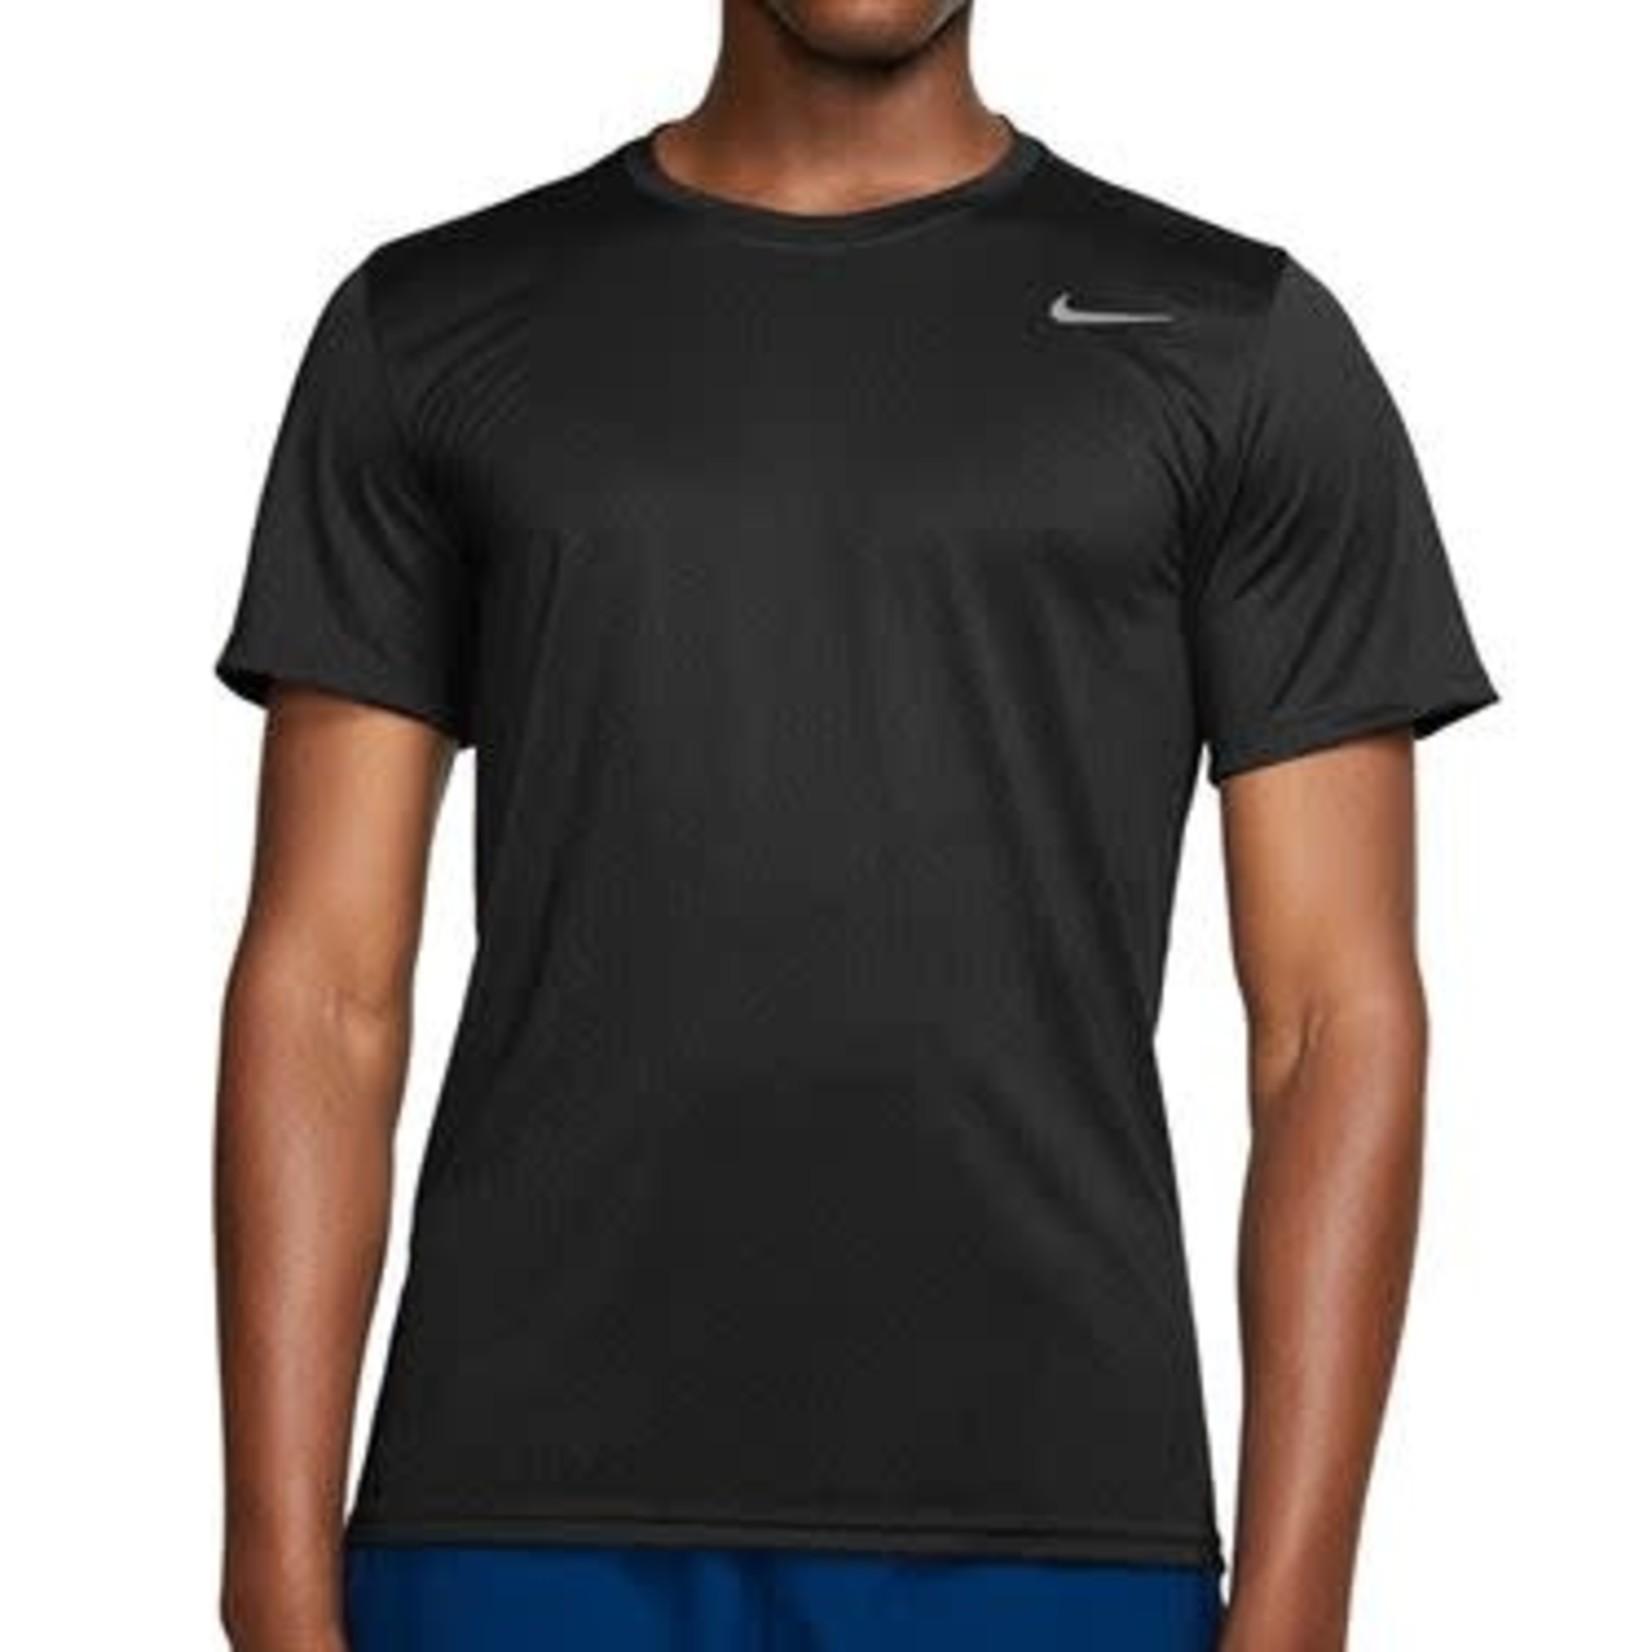 Nike Nike T-Shirt, Legend 2.0, Mens